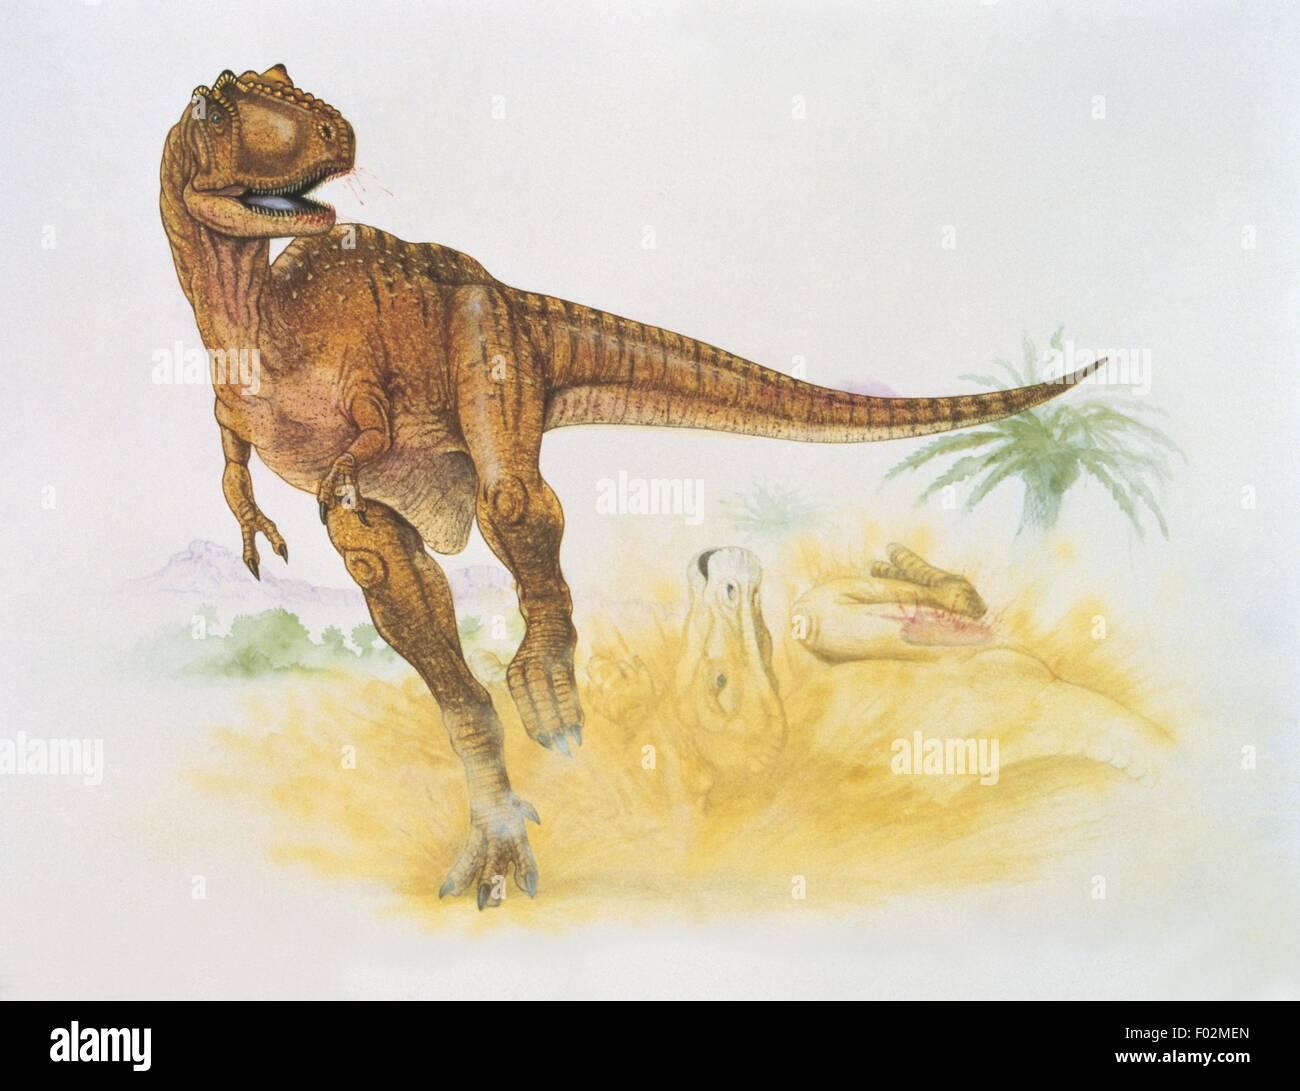 Palaeozoology - Cretaceous Period - Dinosaurs - Albertosaurus (art work by Graham Rosewarne) Stock Photo